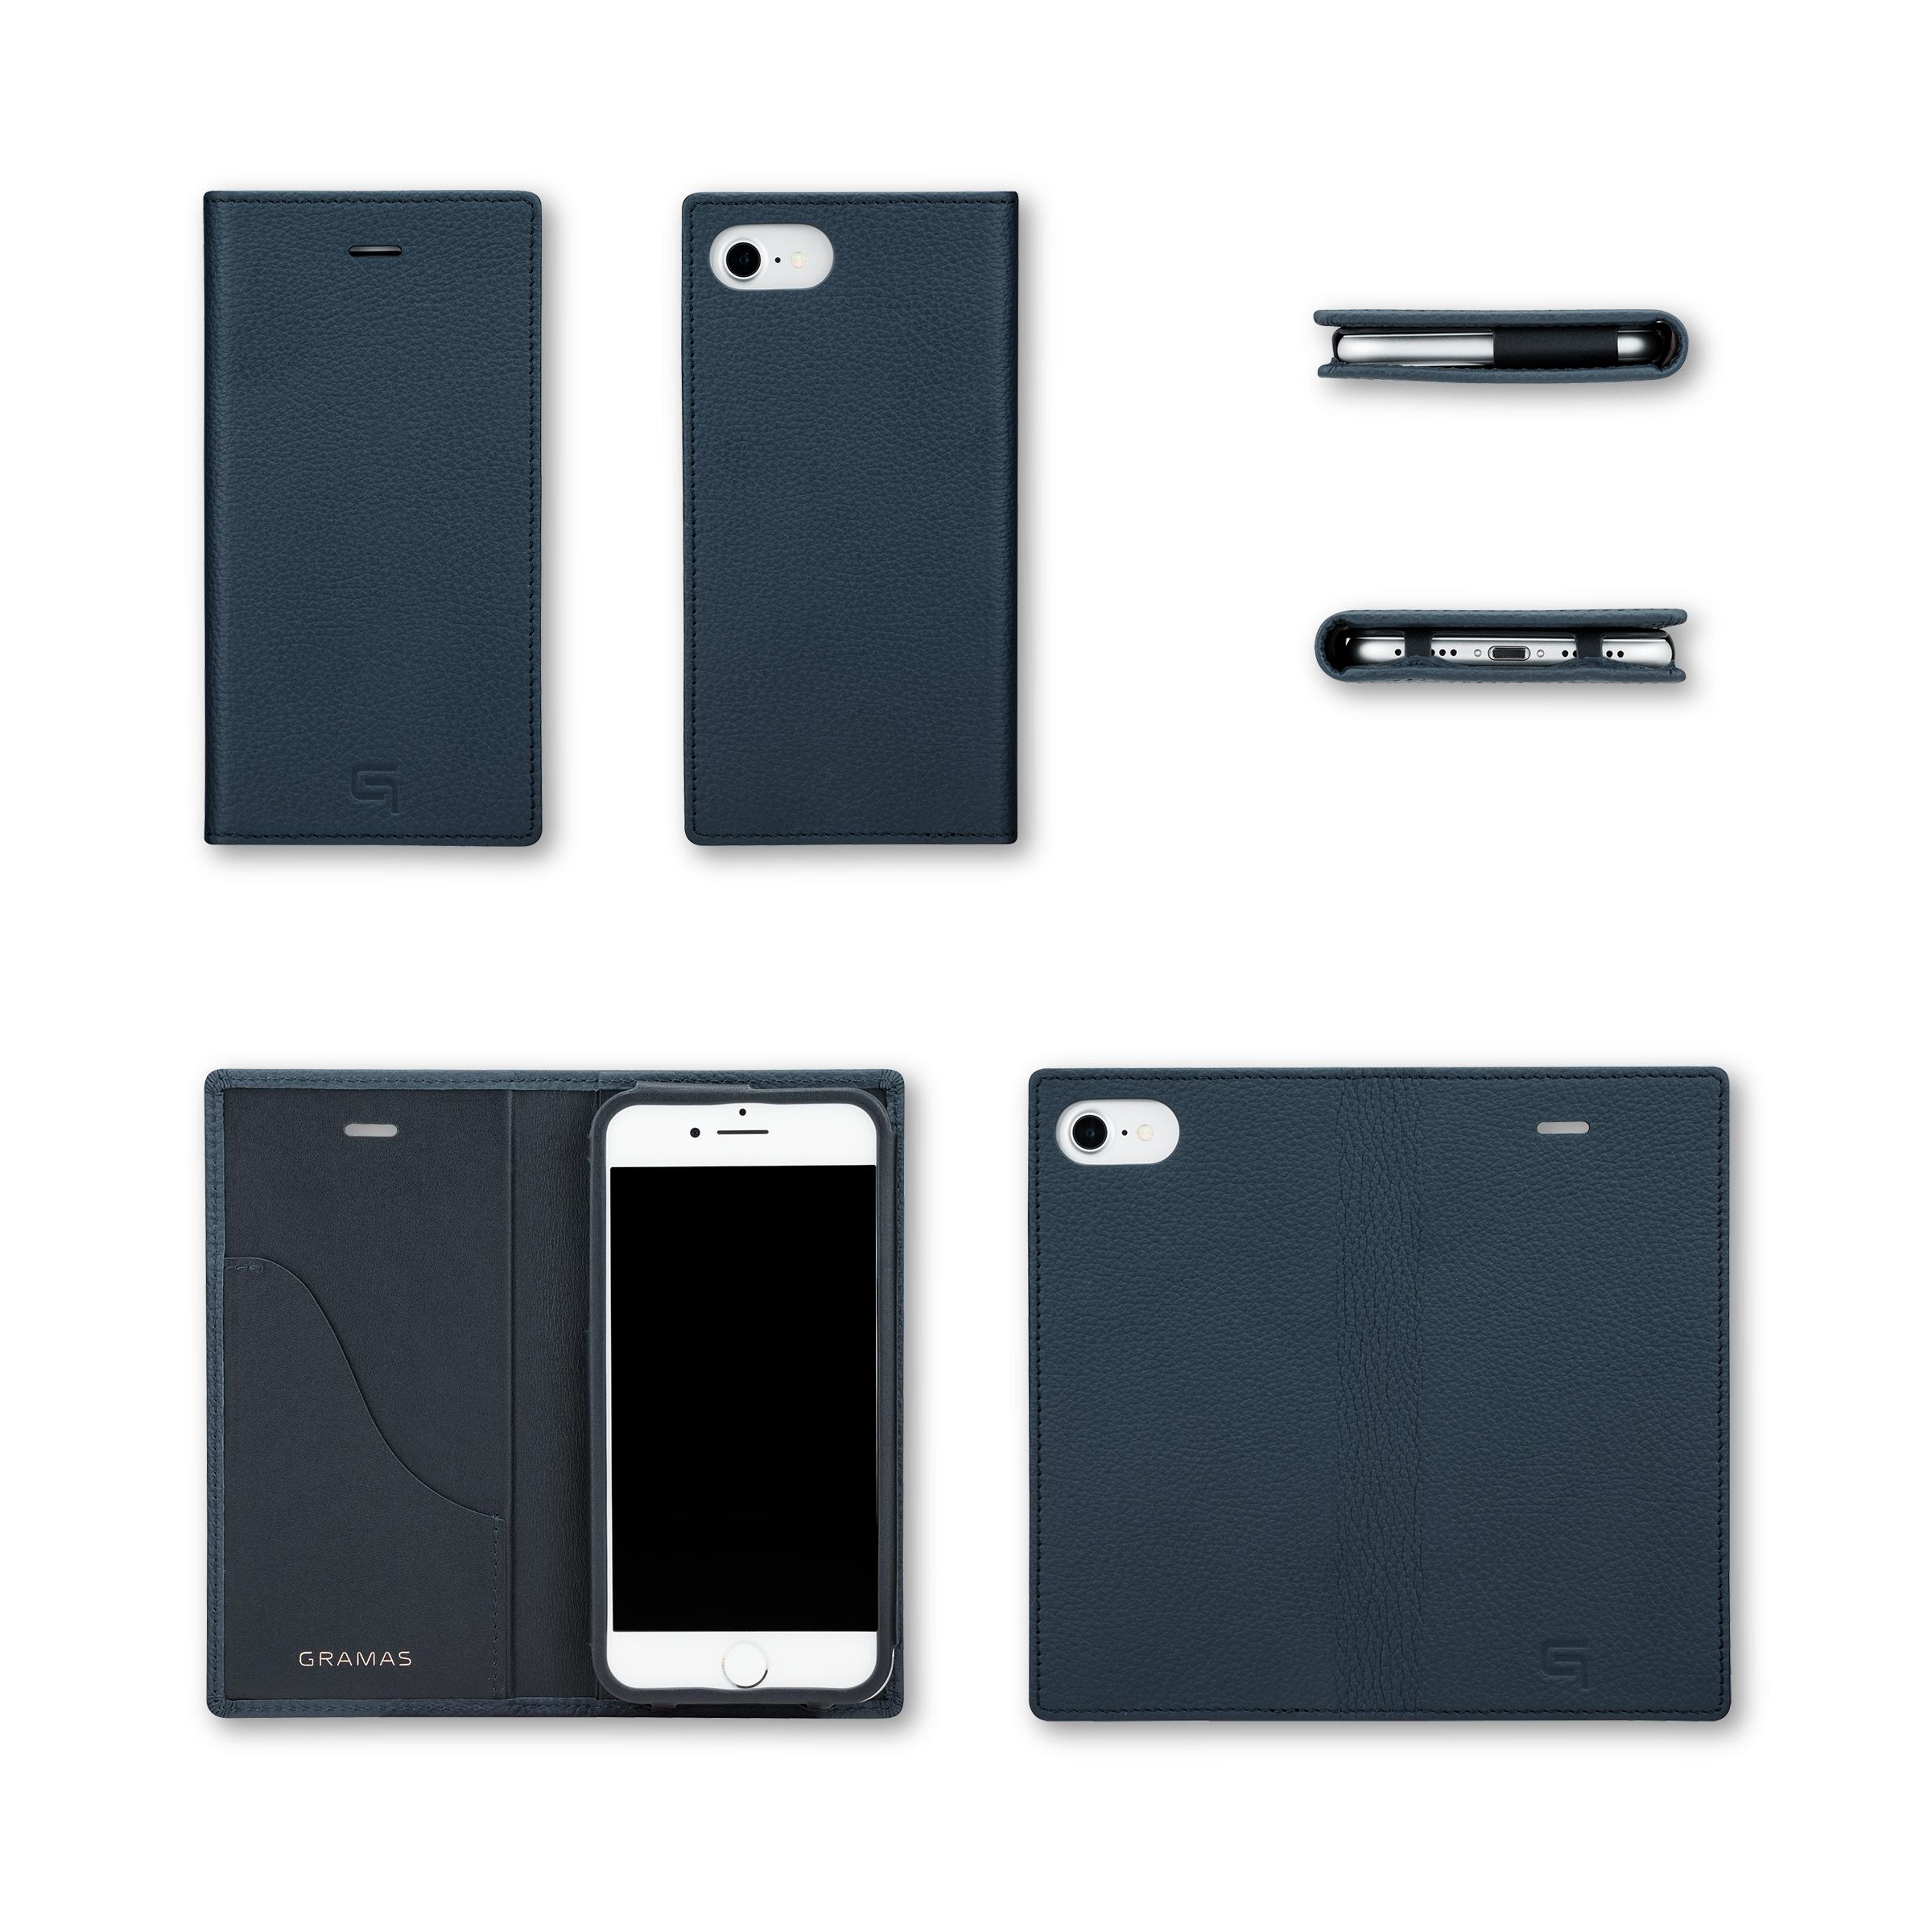 GRAMAS Shrunken-calf Full Leather Case for iPhone 7(Purple) シュランケンカーフ 手帳型フルレザーケース GLC646PR - 画像5